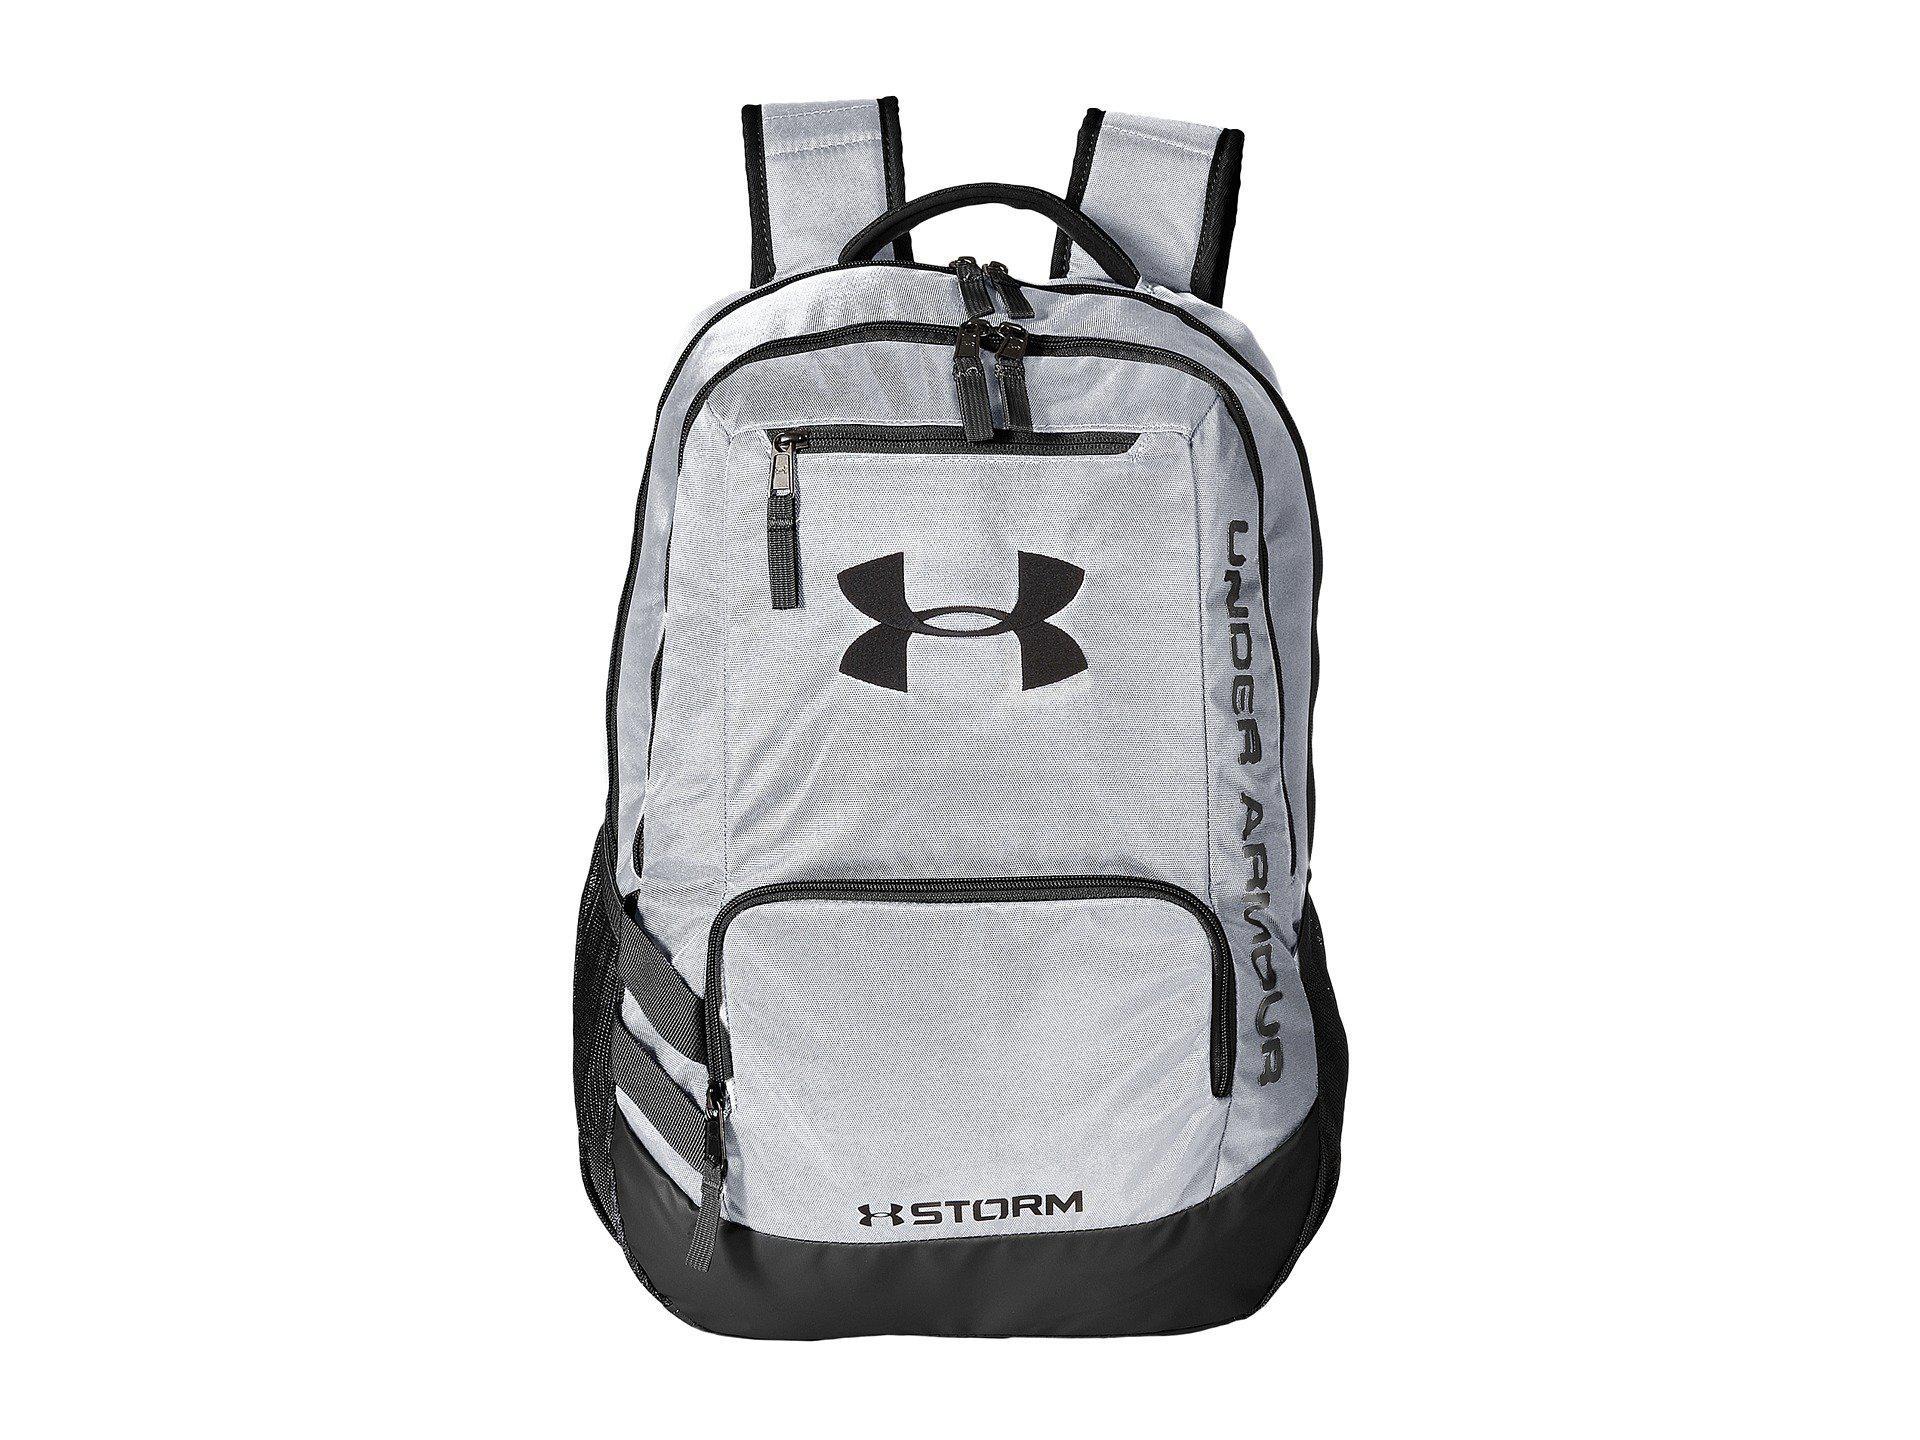 8fa7c027d0 Lyst - Under Armour Ua Team Hustle Backpack in White for Men